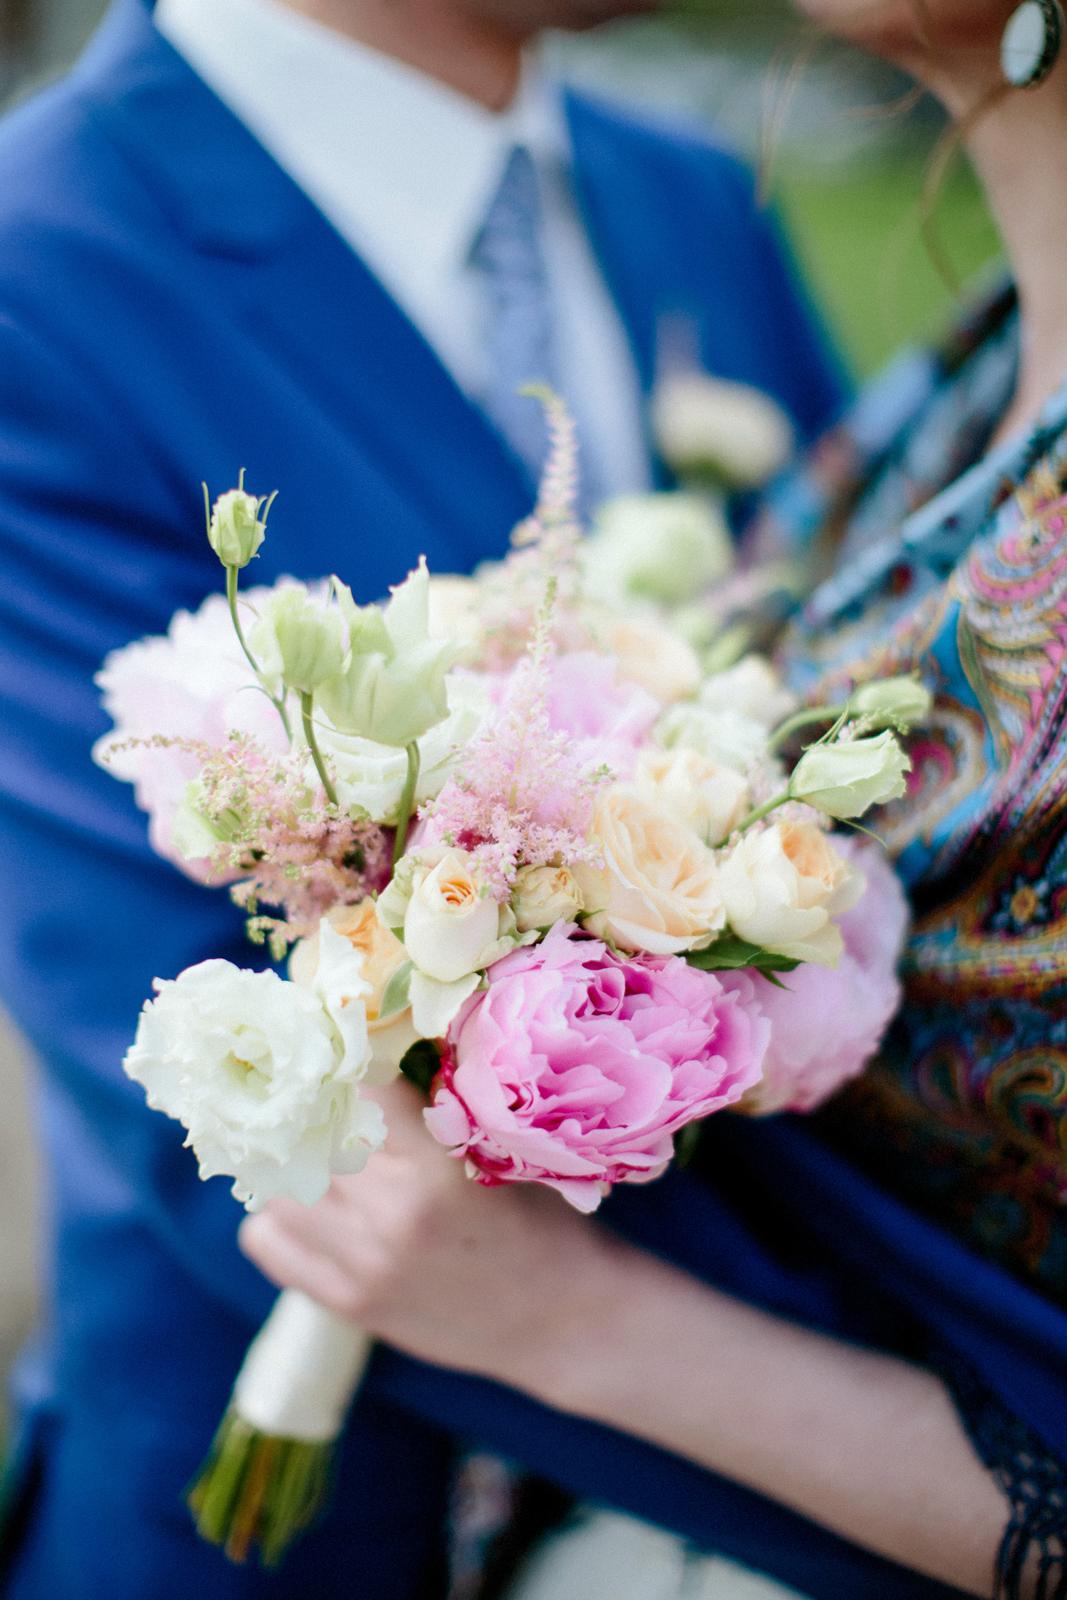 shapor photography wedding 20.05.2017-369 (1)